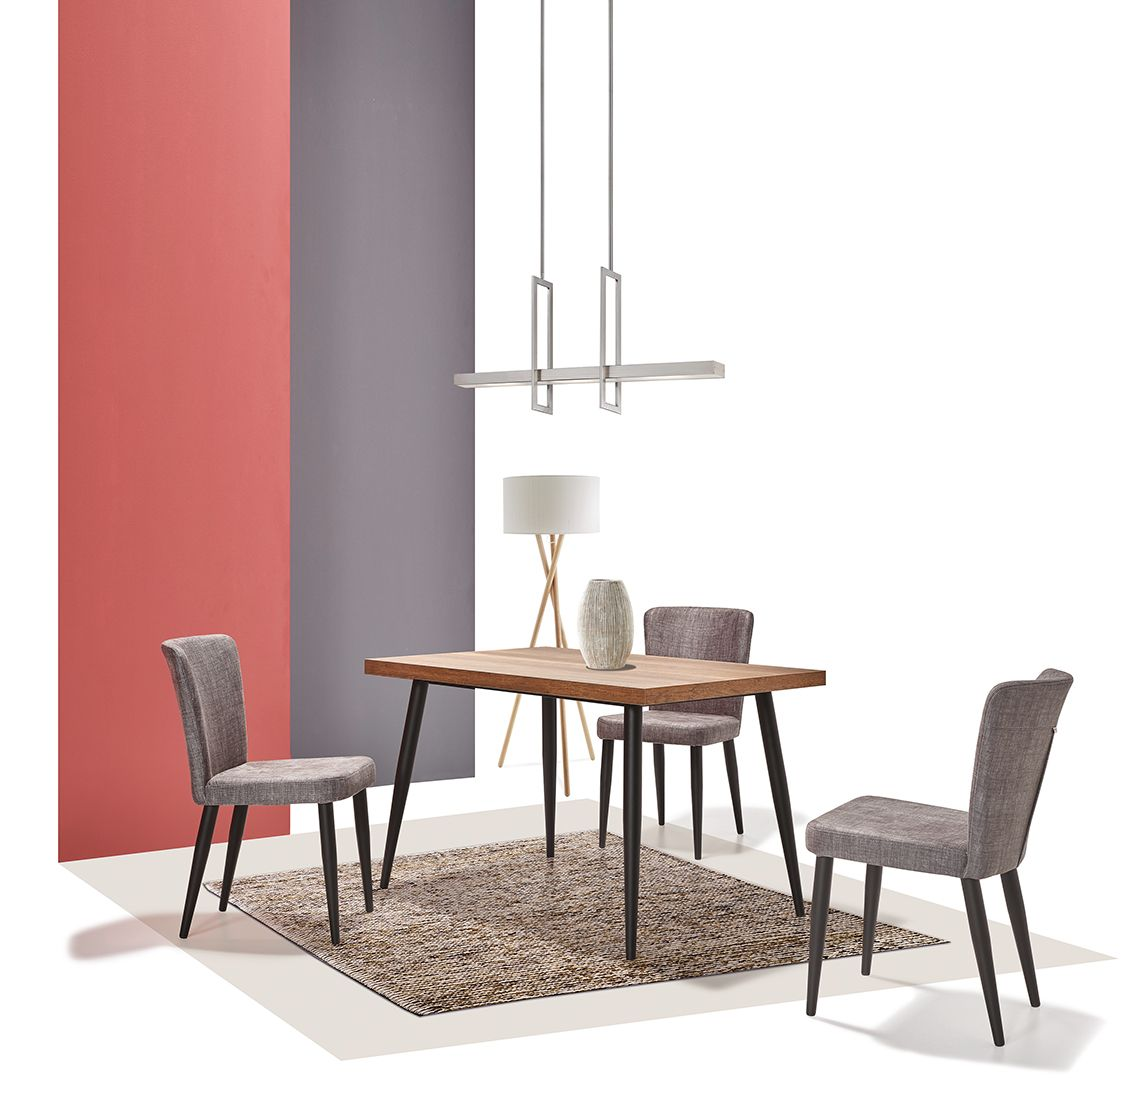 Decosit Furniture Catalog Shooting & Design | Volkan Erbilir Works ...